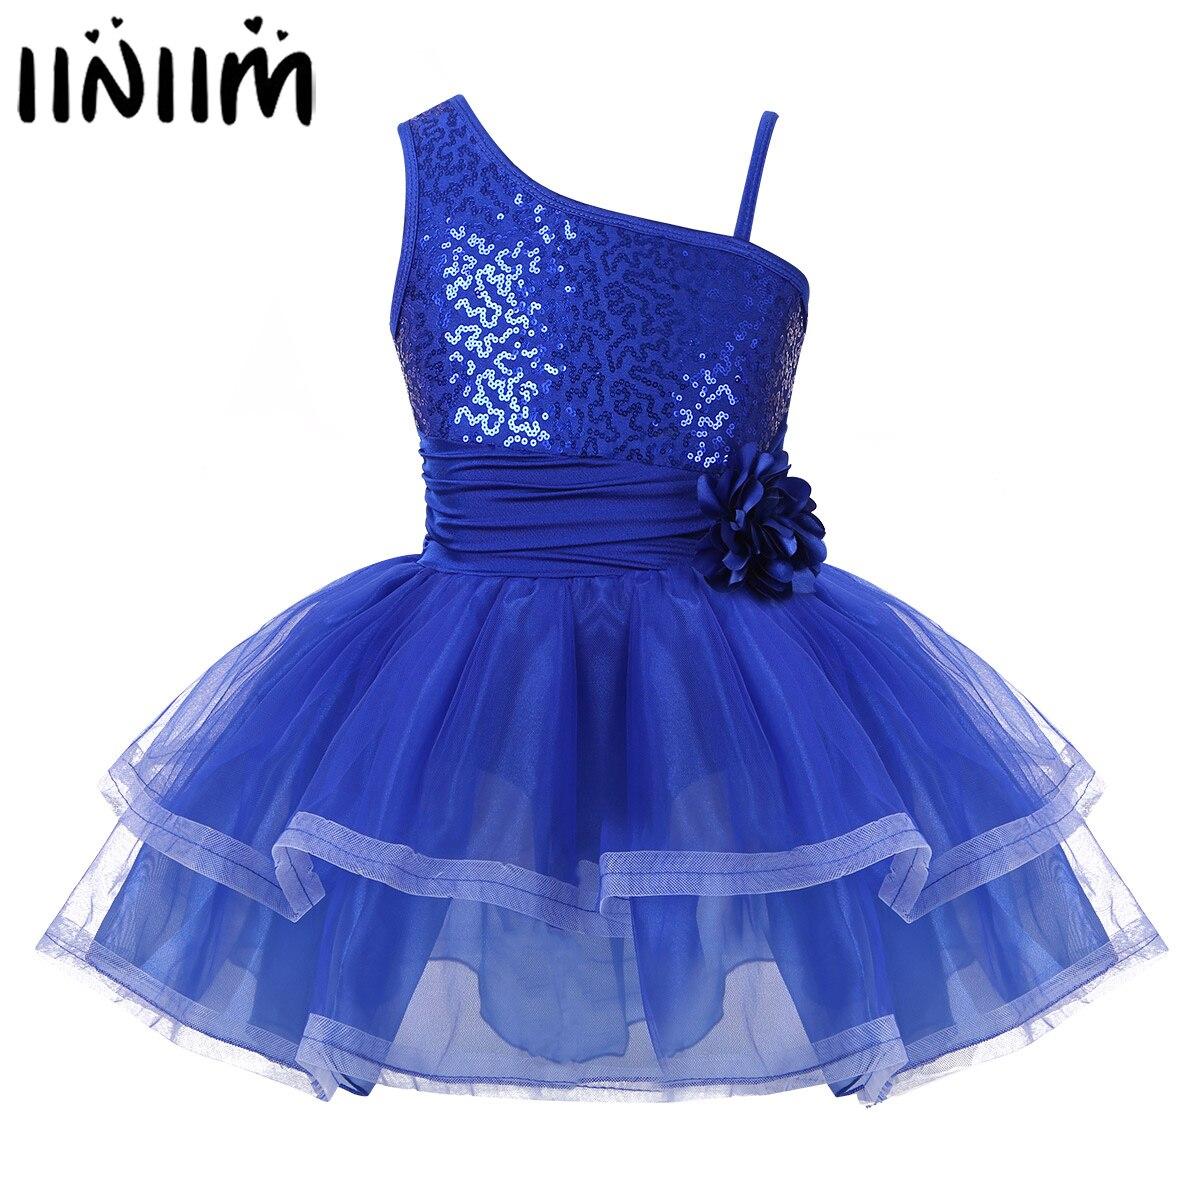 kids-girls-dance-ballerina-one-shoulder-design-sequins-flower-font-b-ballet-b-font-dancewear-costumes-for-kids-gymnastics-leotard-tutu-dress